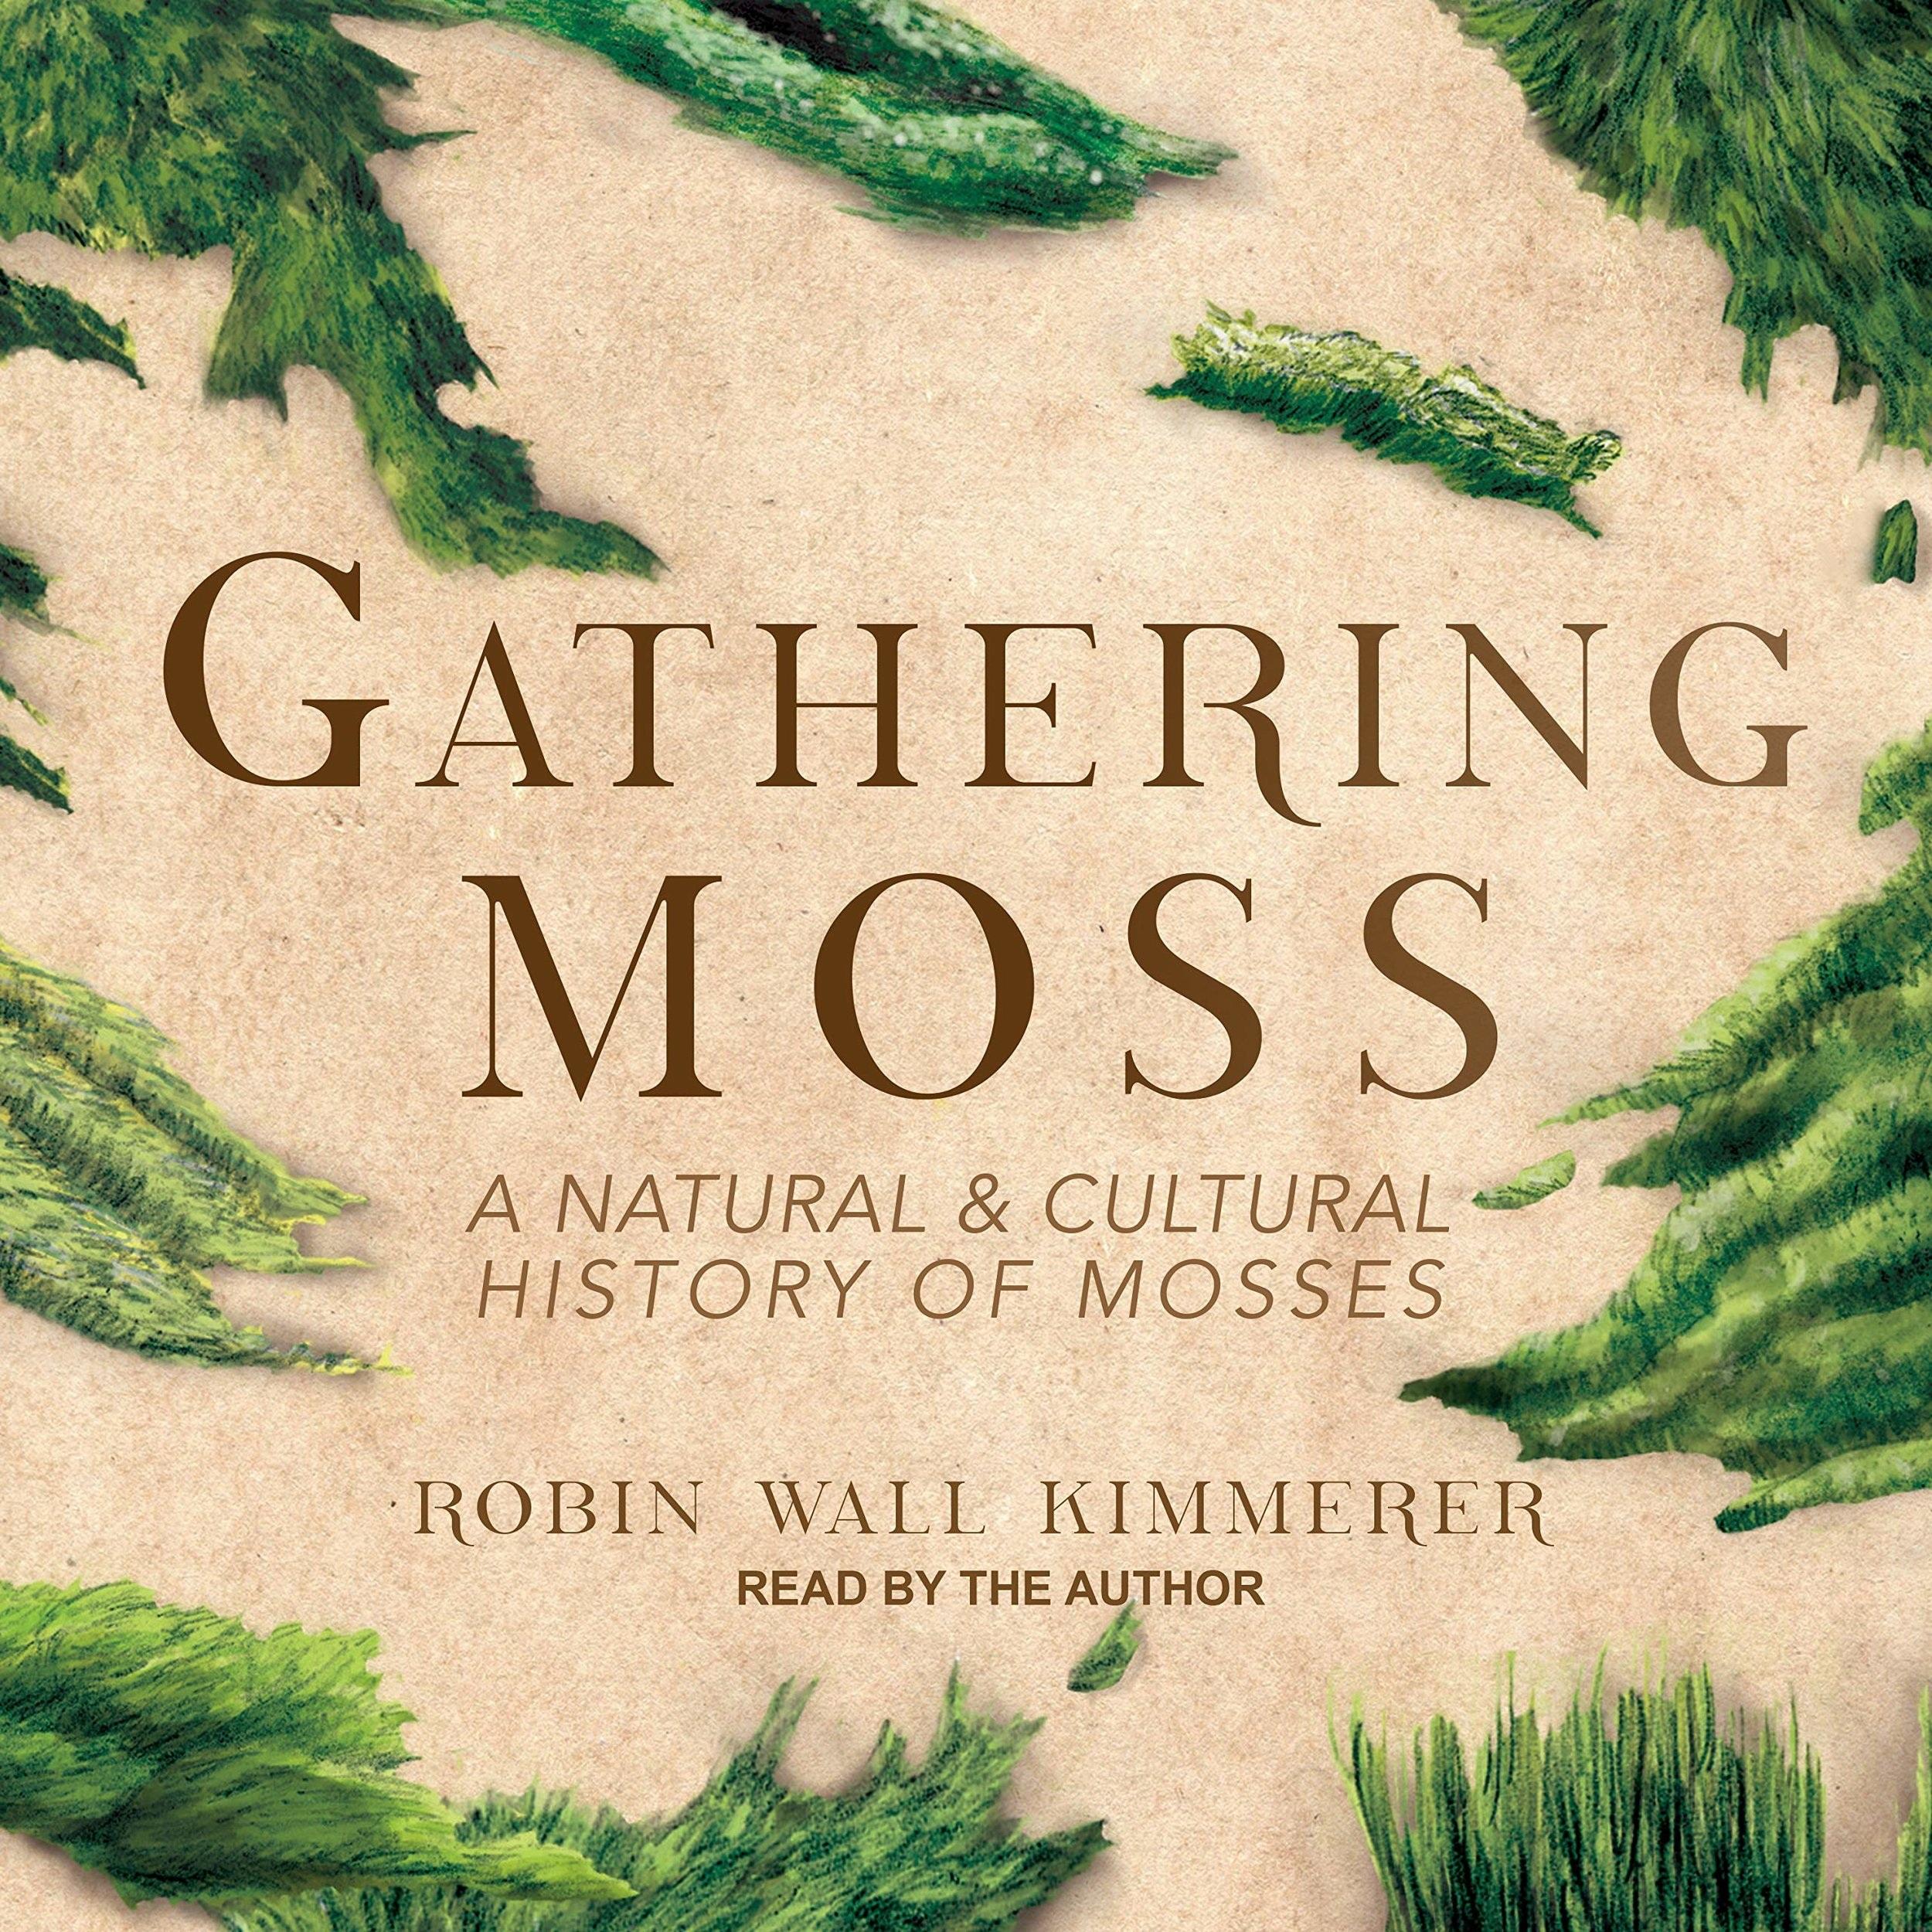 JUly - Gathering Moss by Robin Wall Kilmmerer